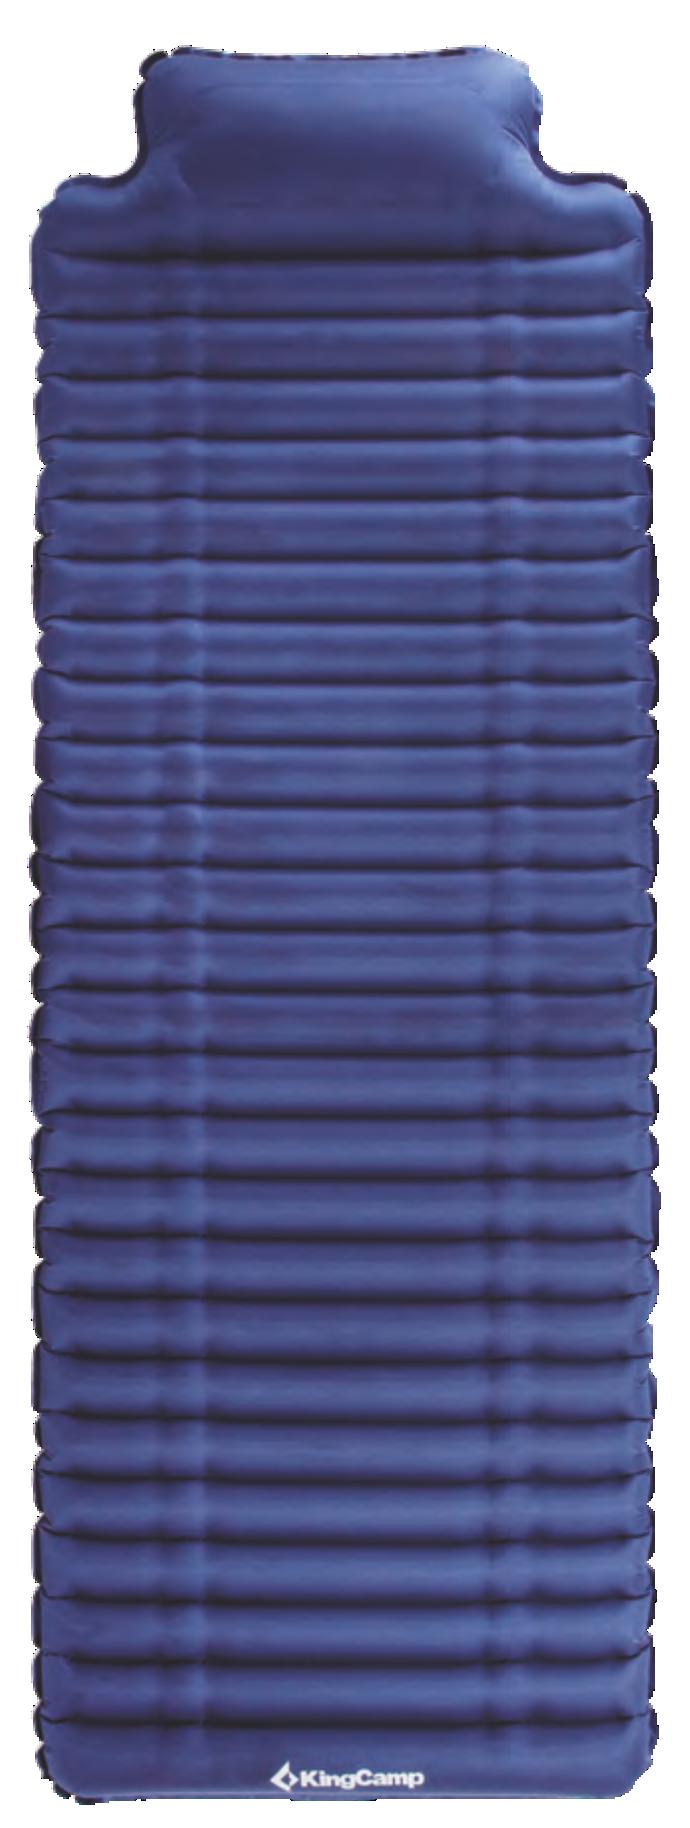 1905 COMFORT LIGHT коврик самонад (синий, 189 х 66 х 7/11 см)